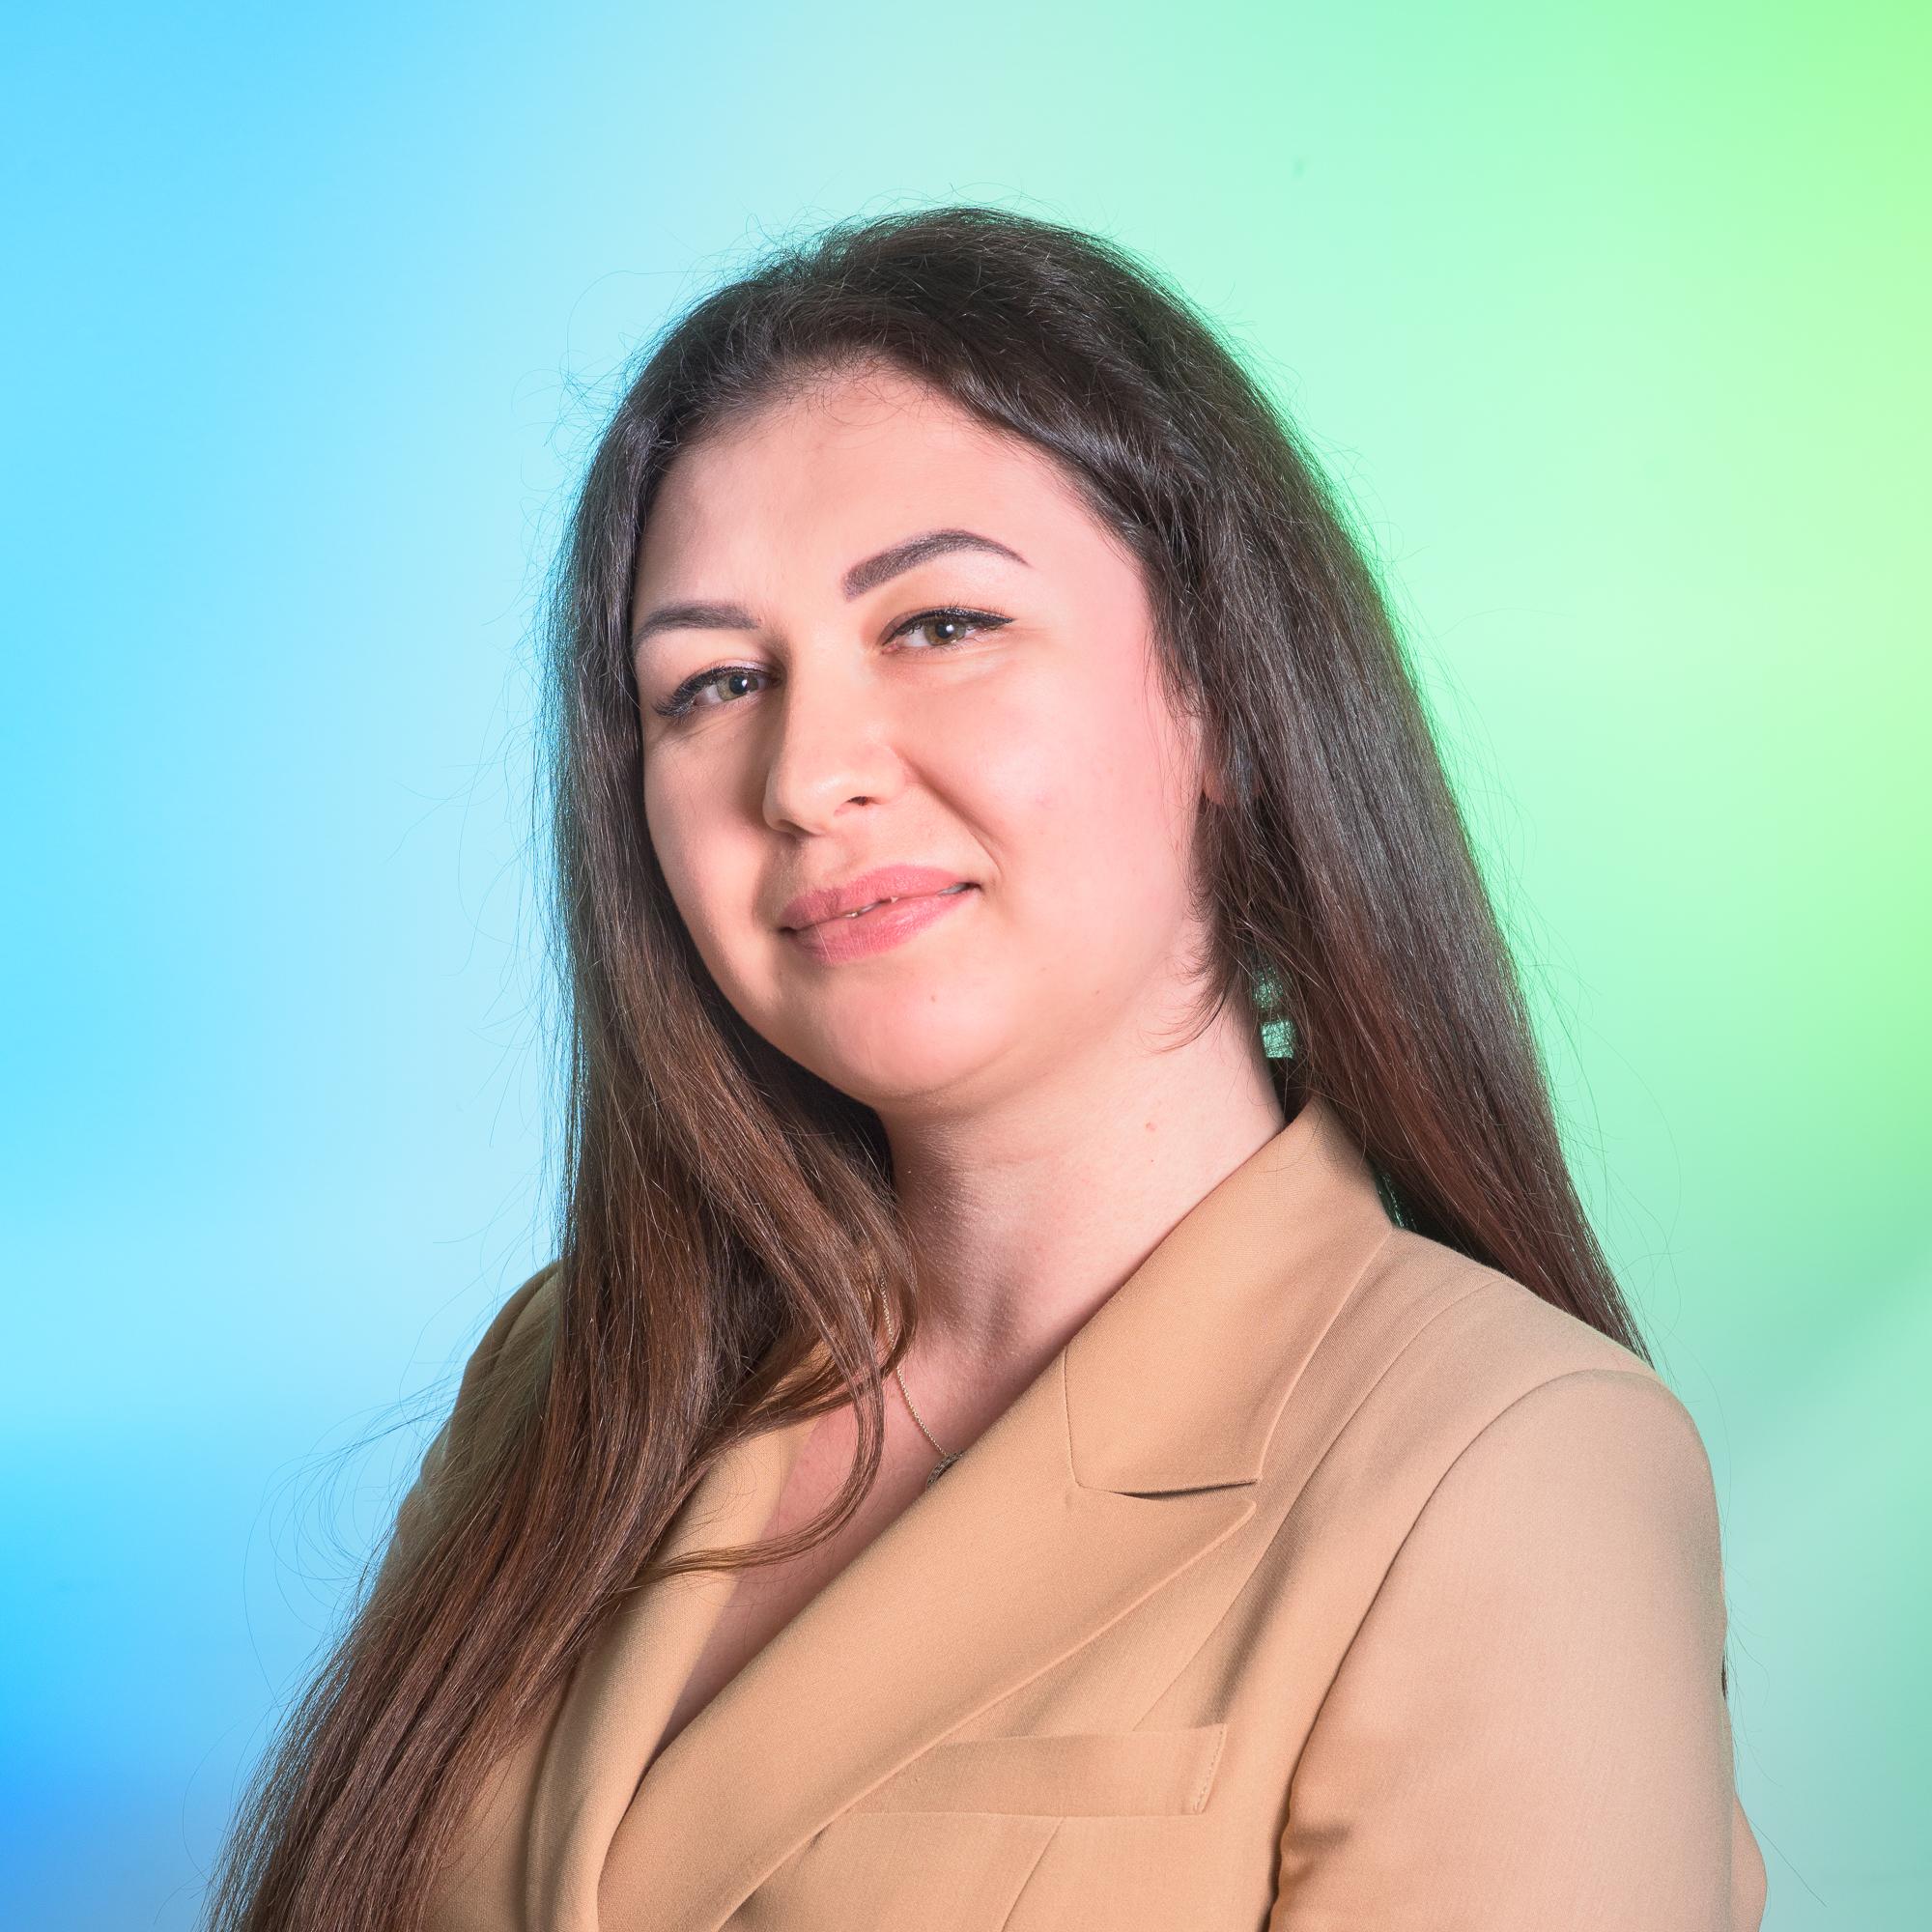 Cristina Sevciuc